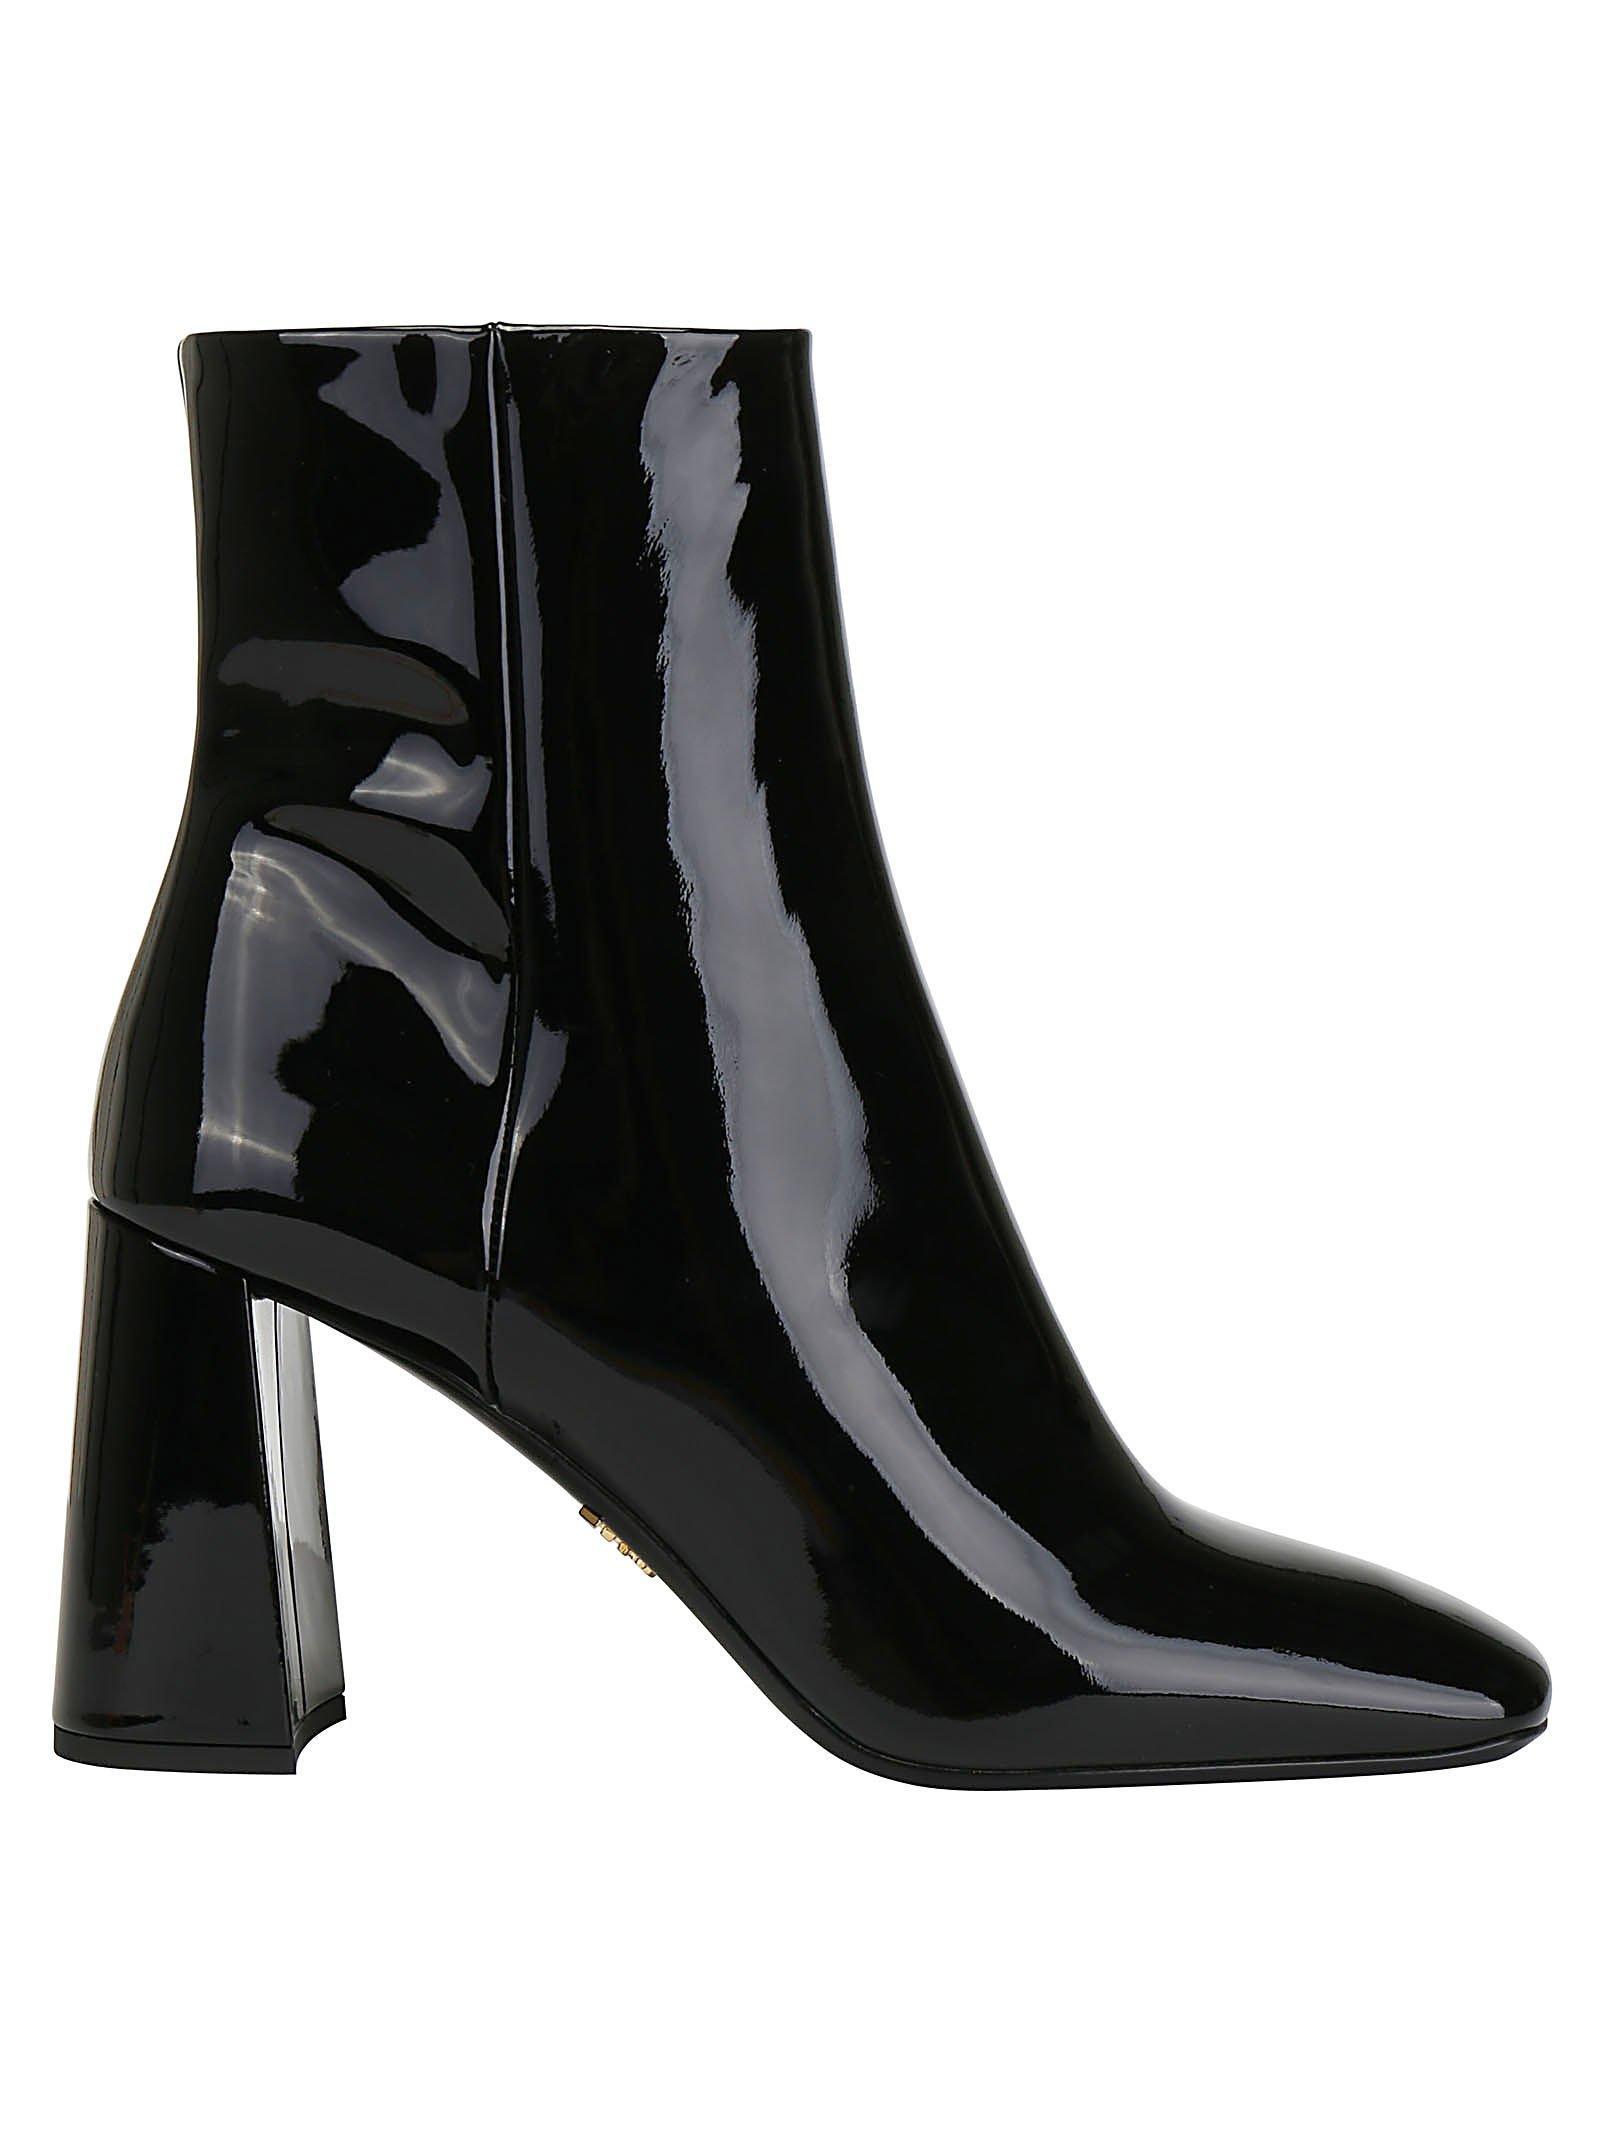 Prada Booties Patent Leather Black